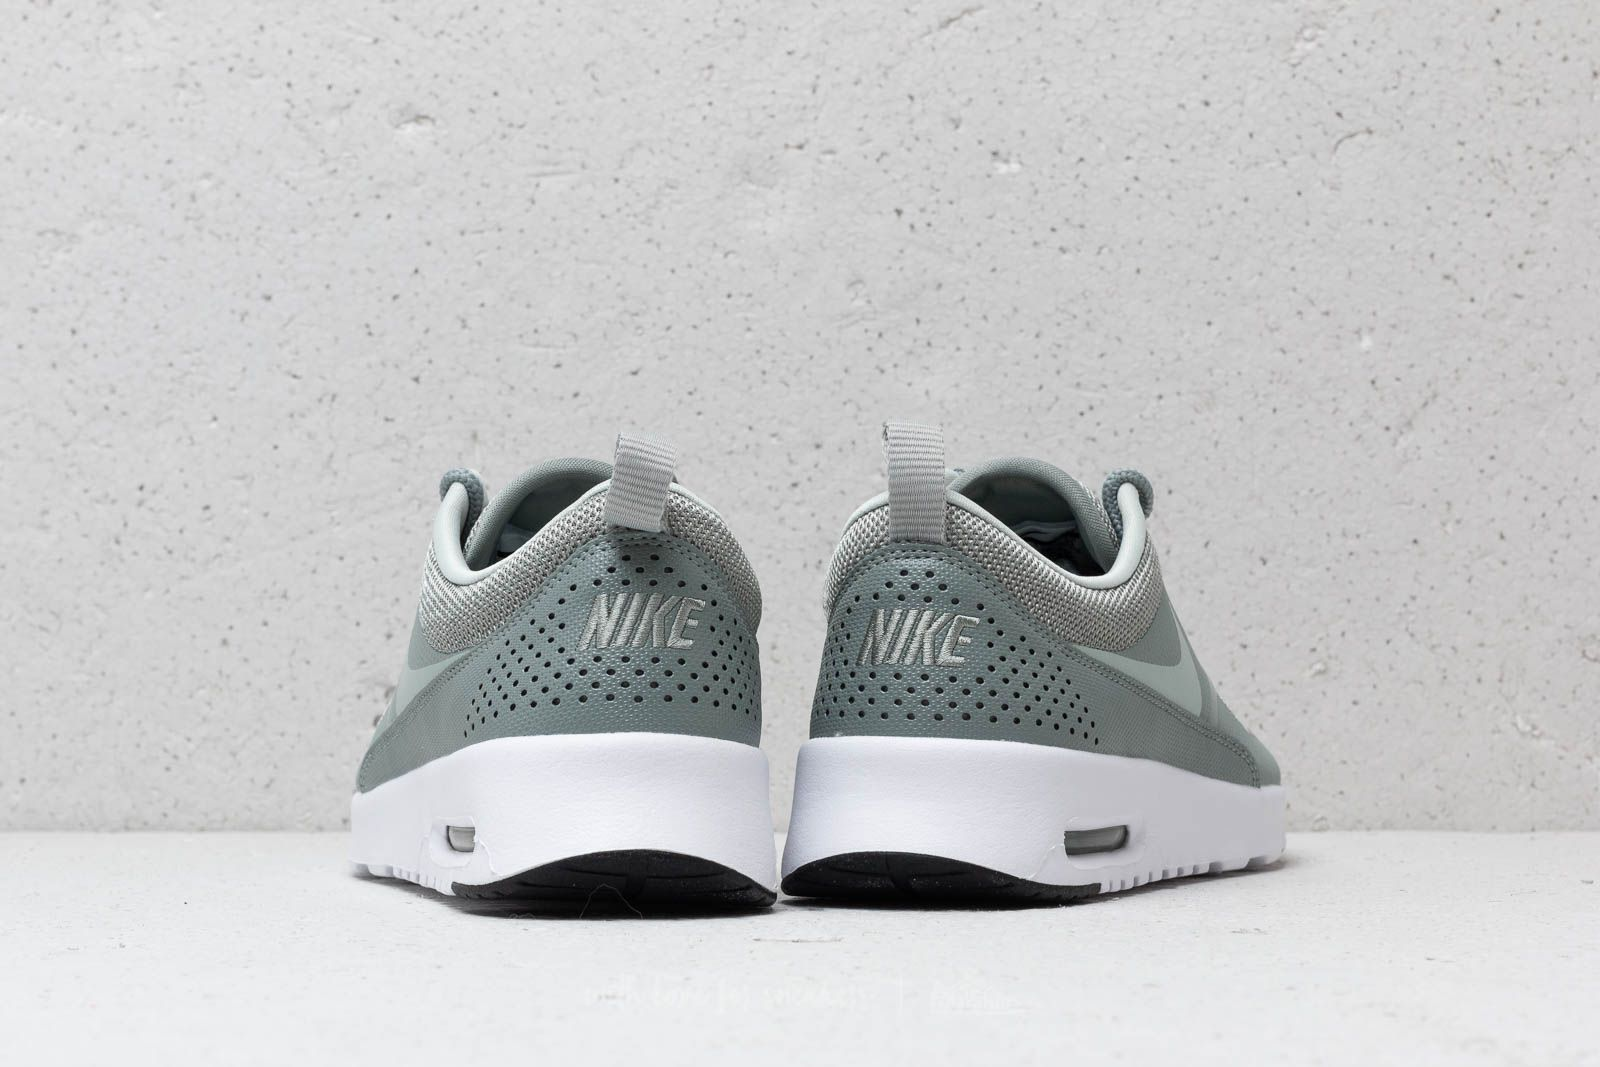 Nike WMNS Air Max Thea Mica Green Light Silver Black Footshop  Footshop